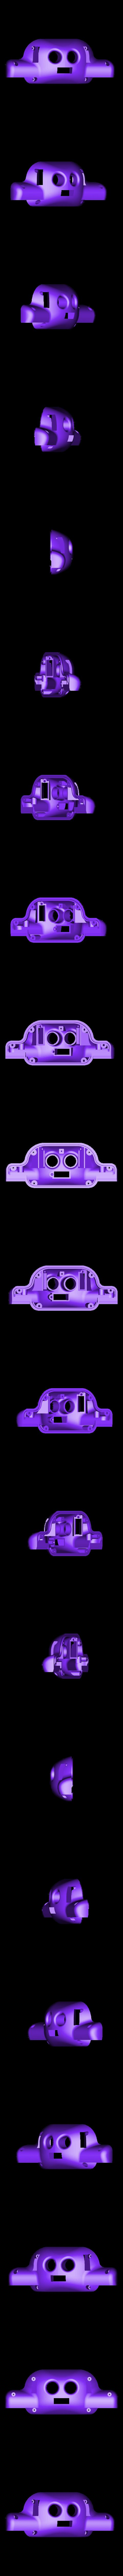 Head_13.1.stl Download free STL file Simula 5 Robot Developers Kit • 3D printable model, JamieLaing